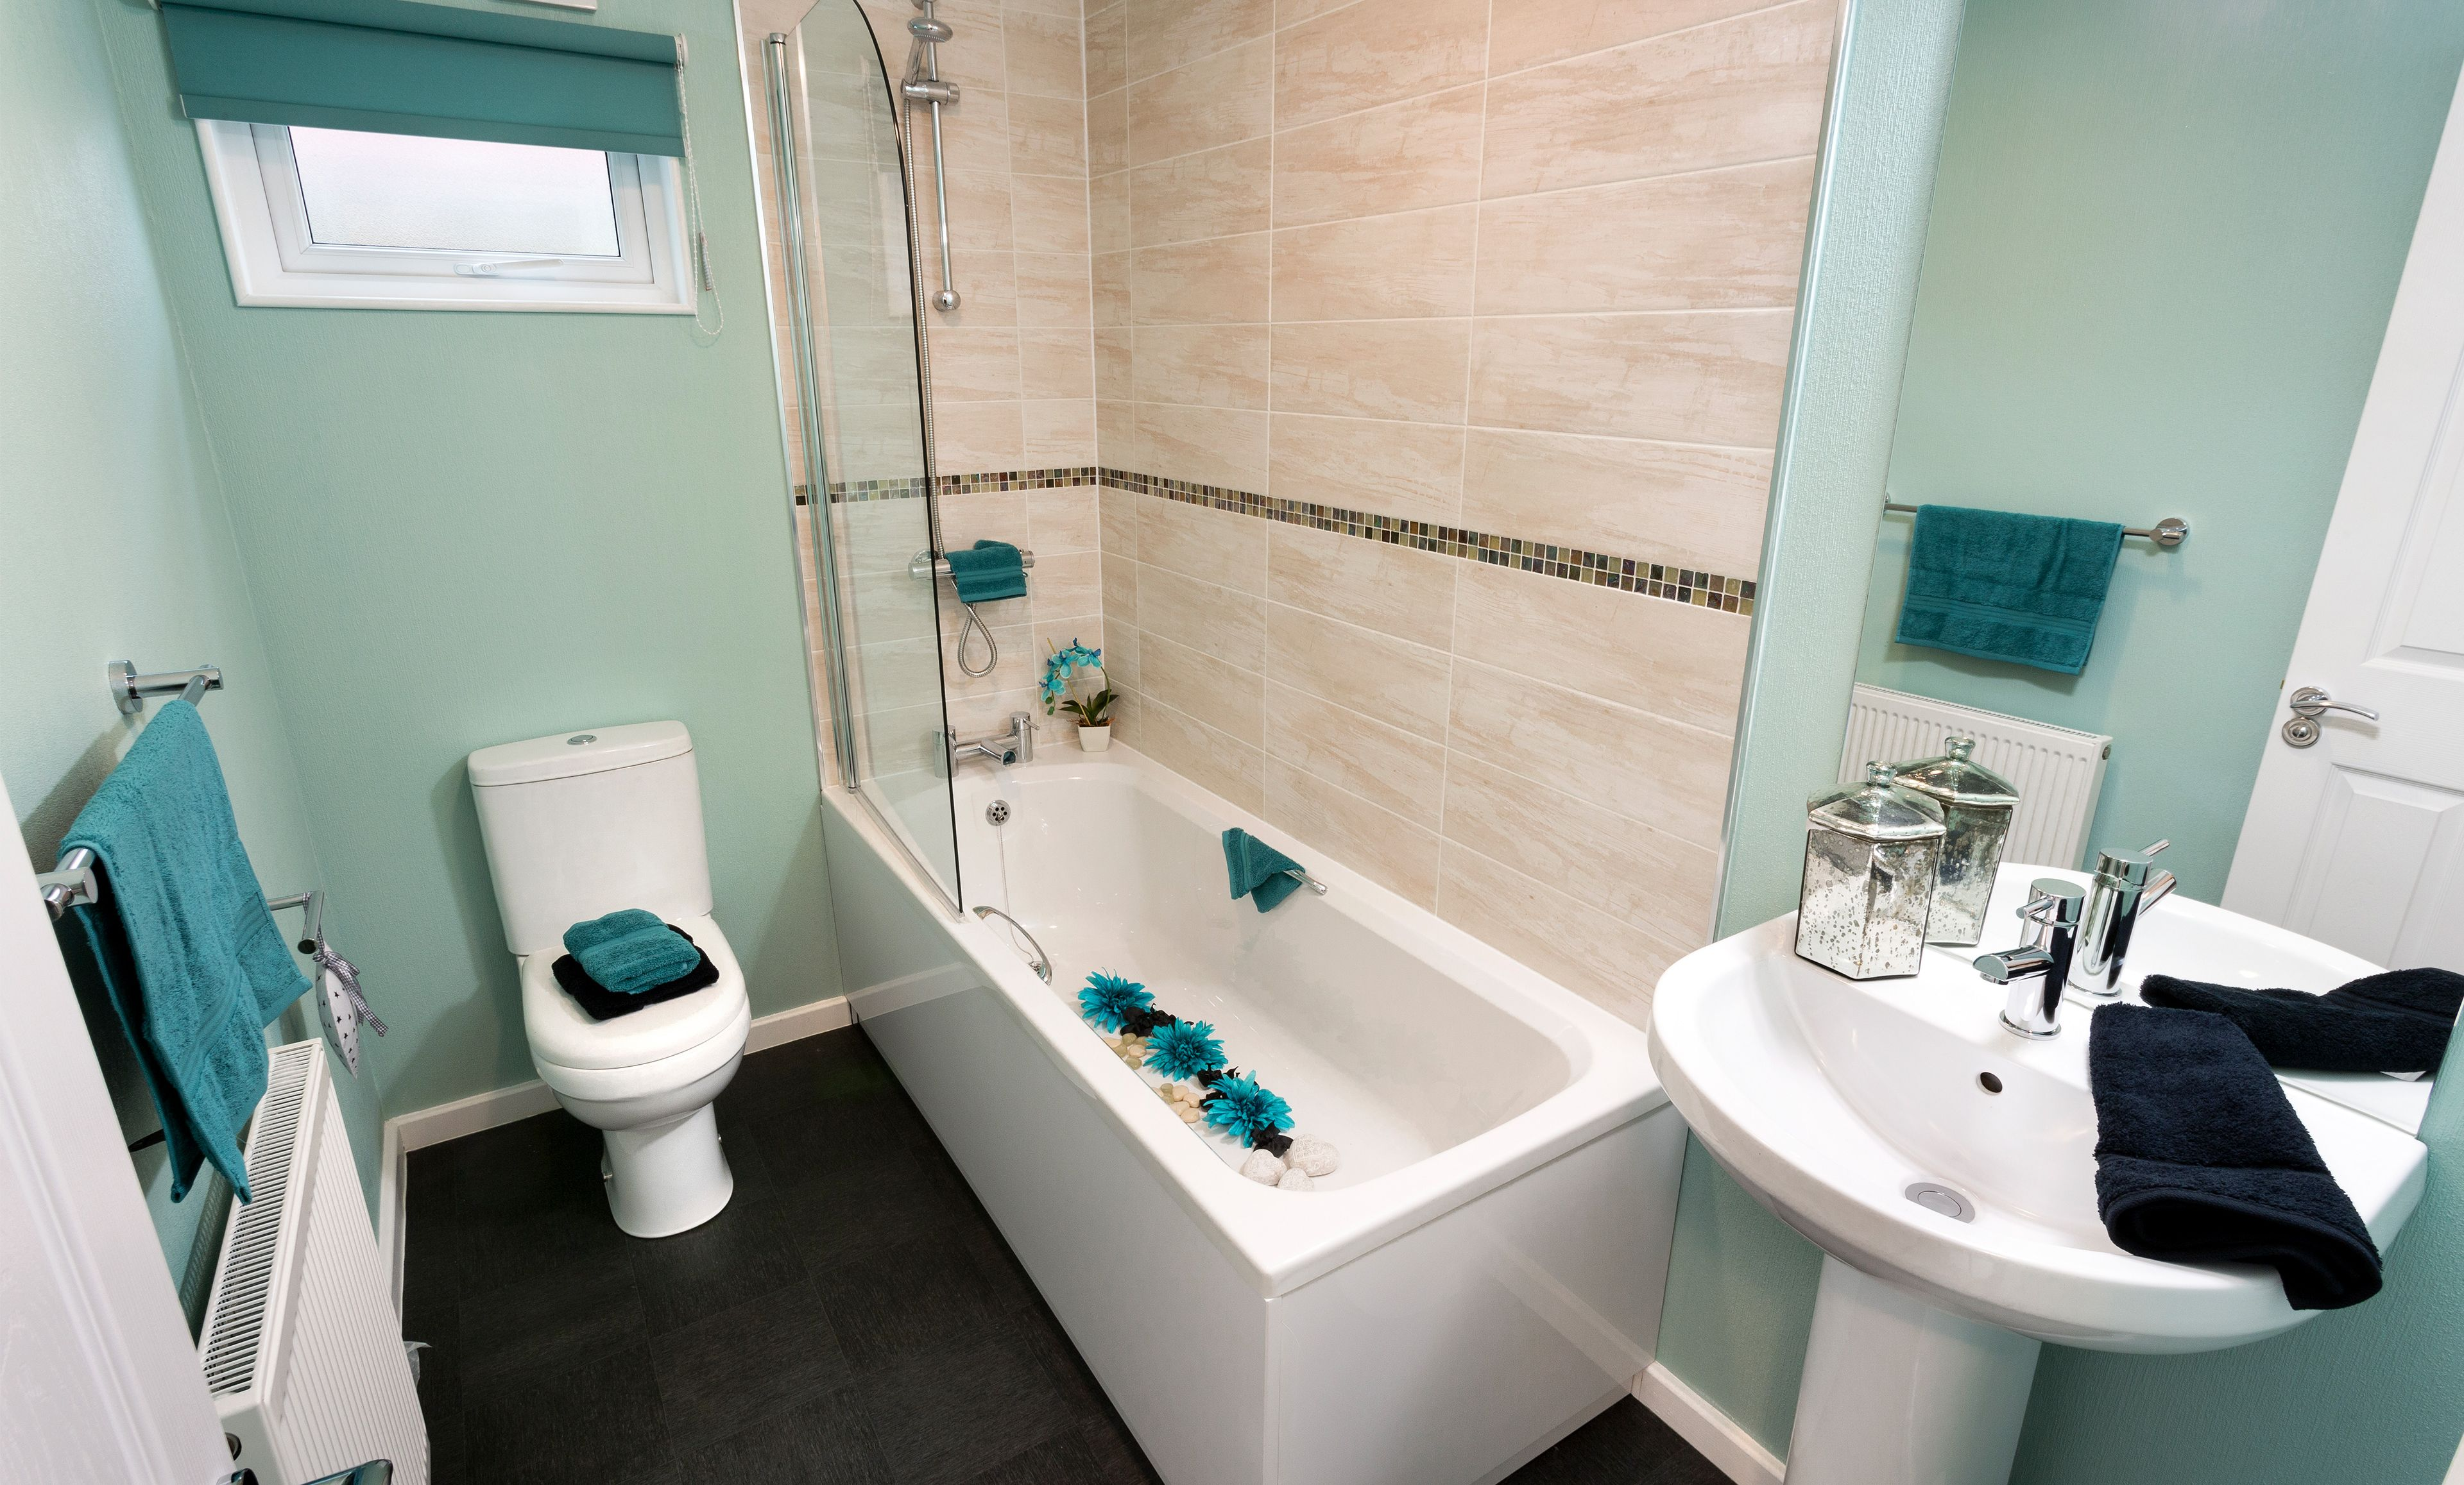 The Hayden Classic Single Bathroom